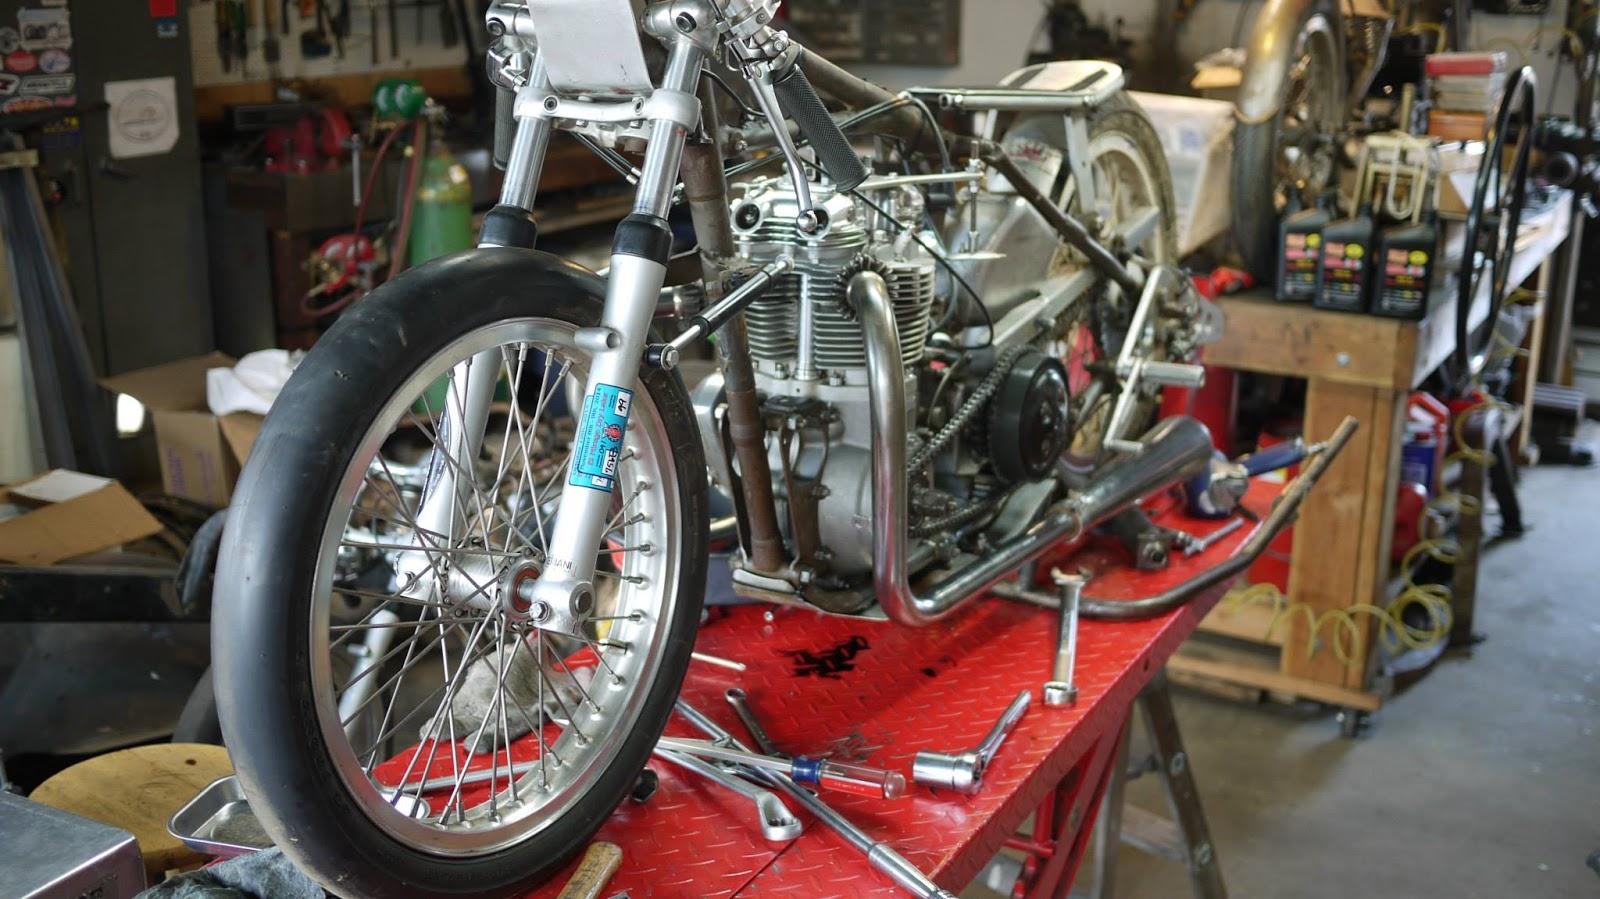 1950 triumph - el mirage 650cc a/pf record holder - bikerMetric